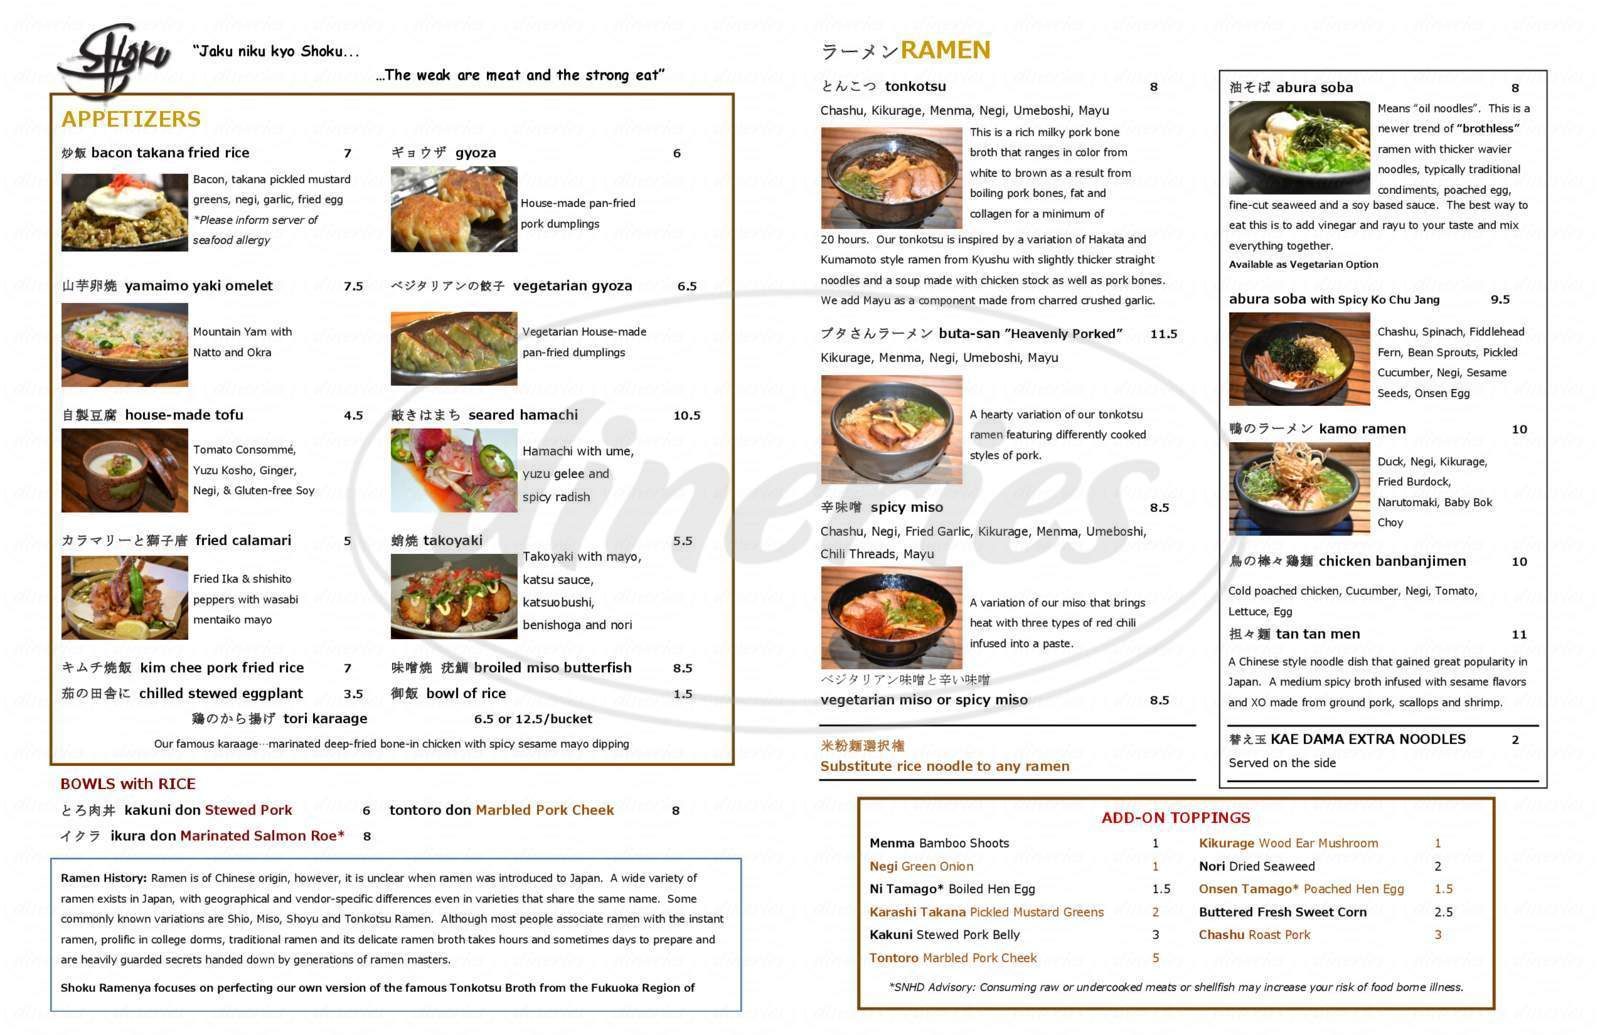 menu for Shoku Ramen